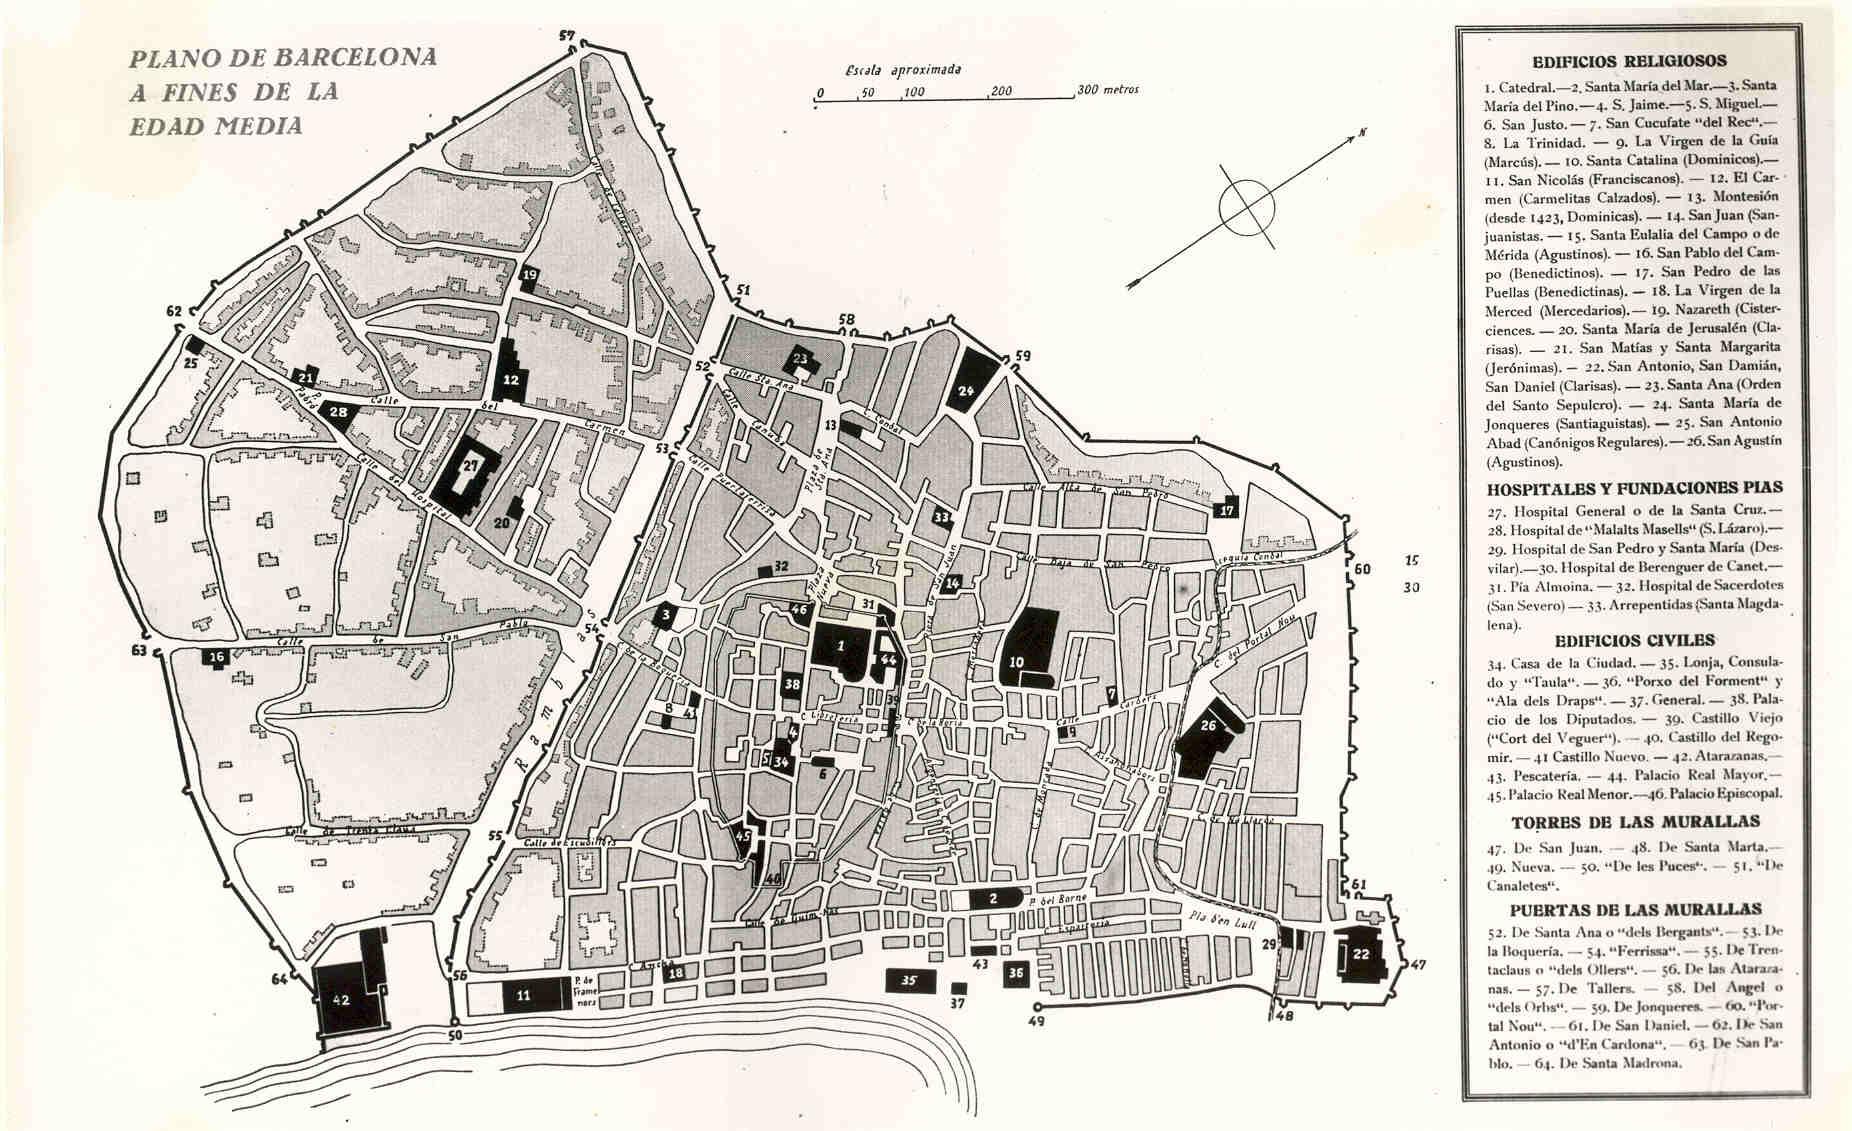 Barcelona a fines de la Edad Media